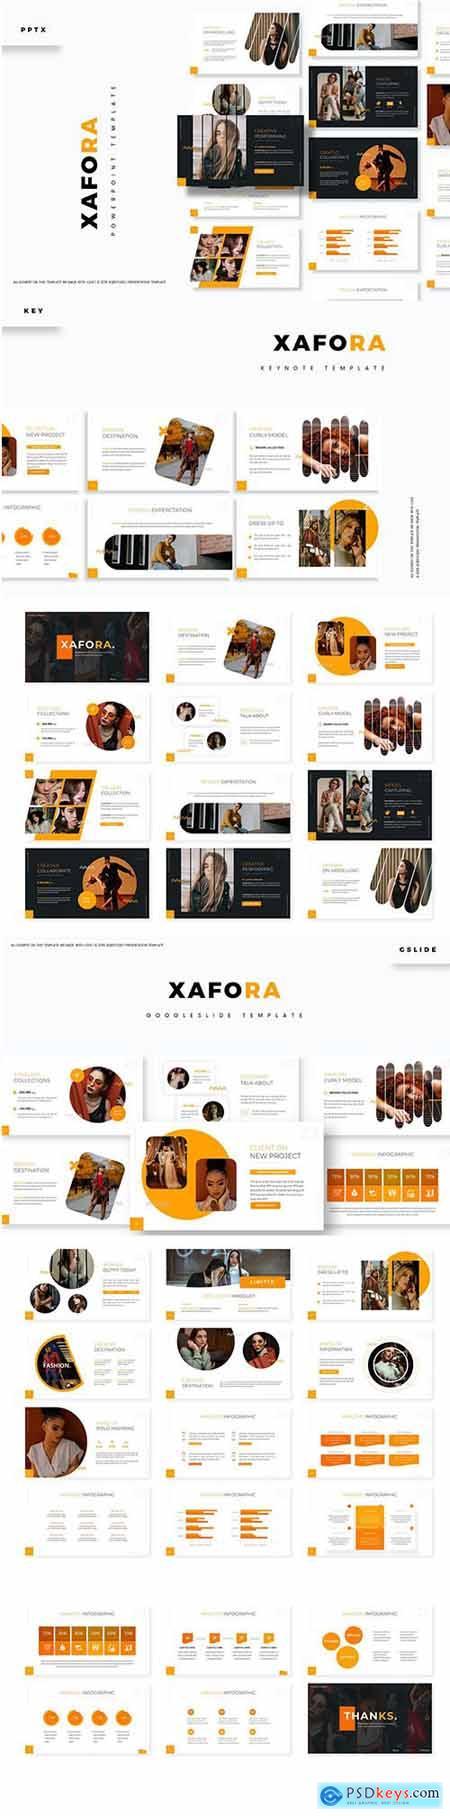 Xafora Powerpoint, Keynote and Google Slide Template